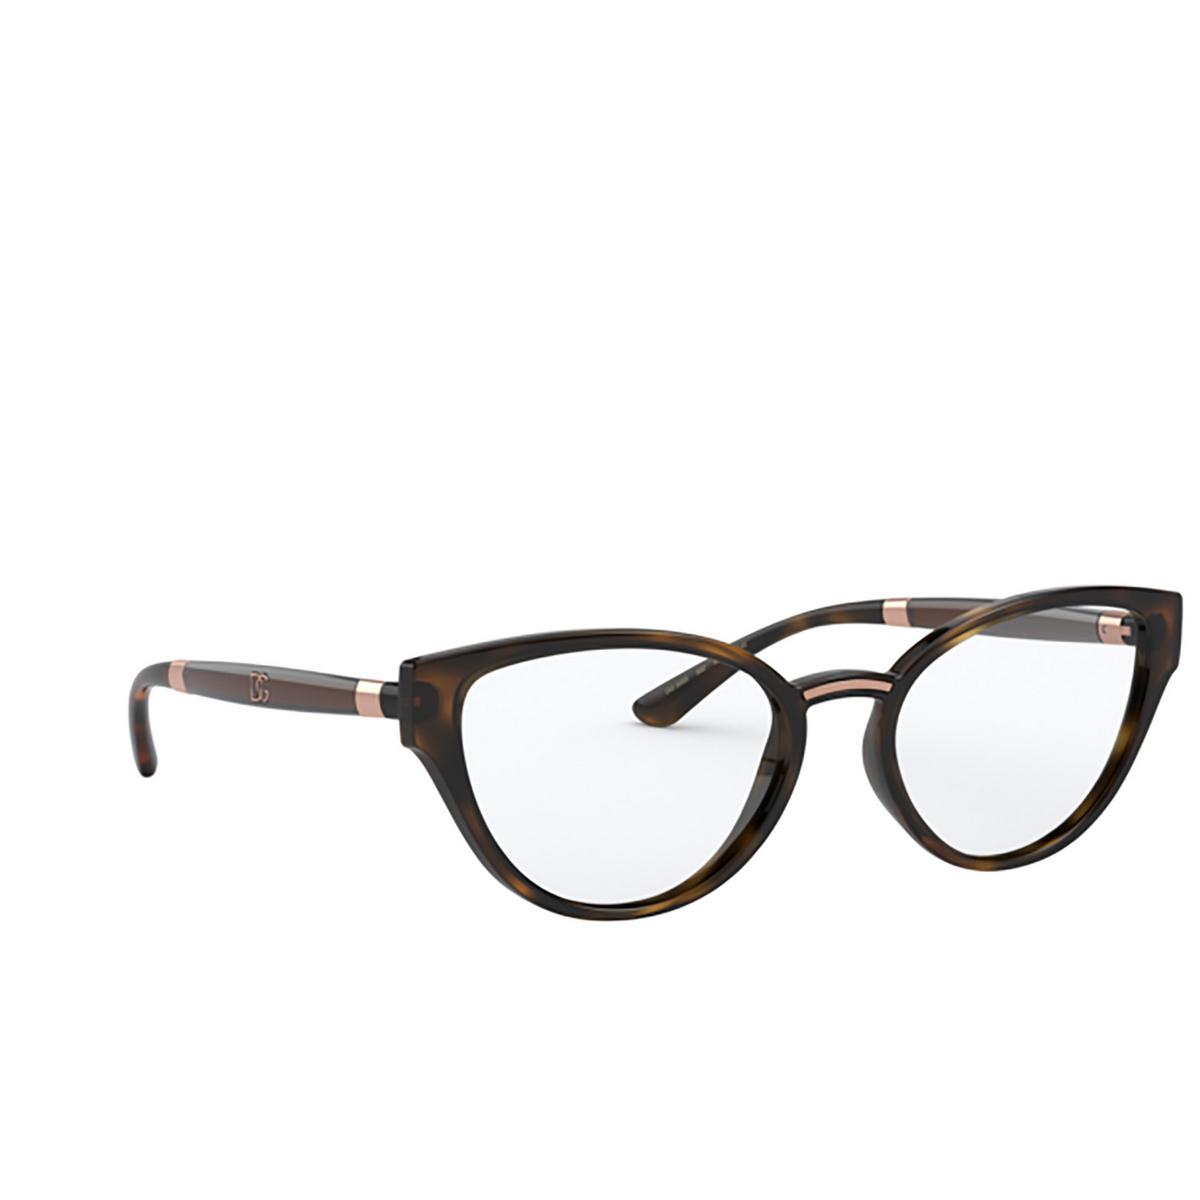 Dolce & Gabbana® Cat-eye Eyeglasses: DG5055 color Havana 502 - three-quarters view.